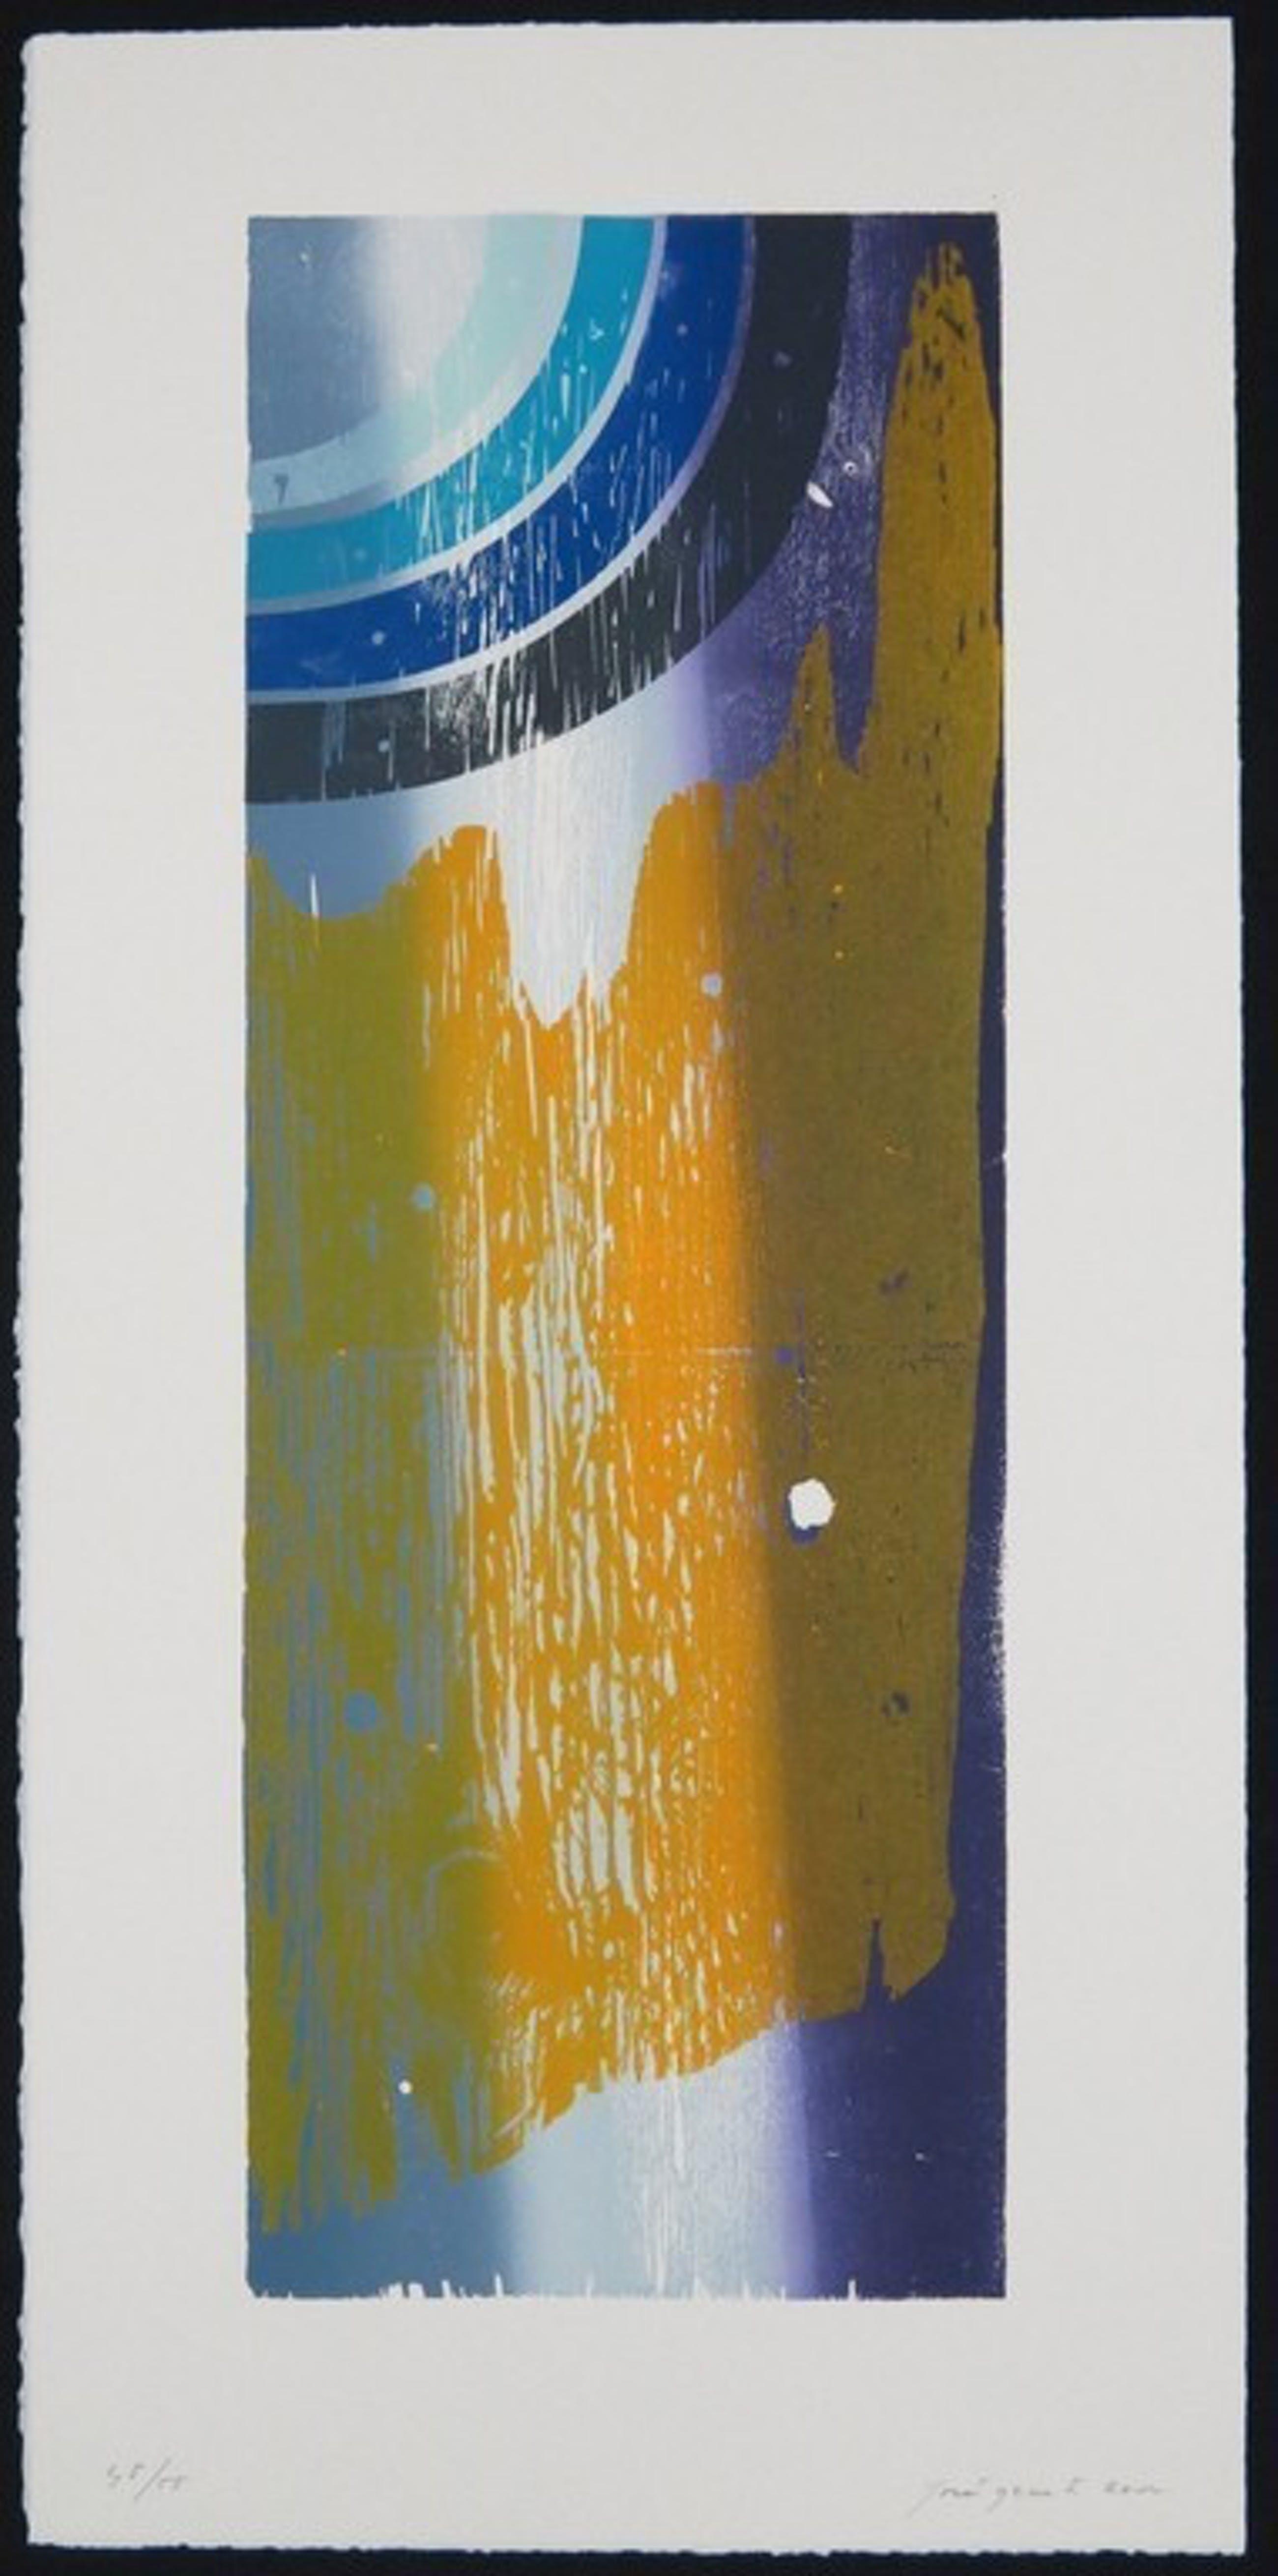 Joris Geurts: Houtsnede, Z.T. (geel/paars) kopen? Bied vanaf 1!